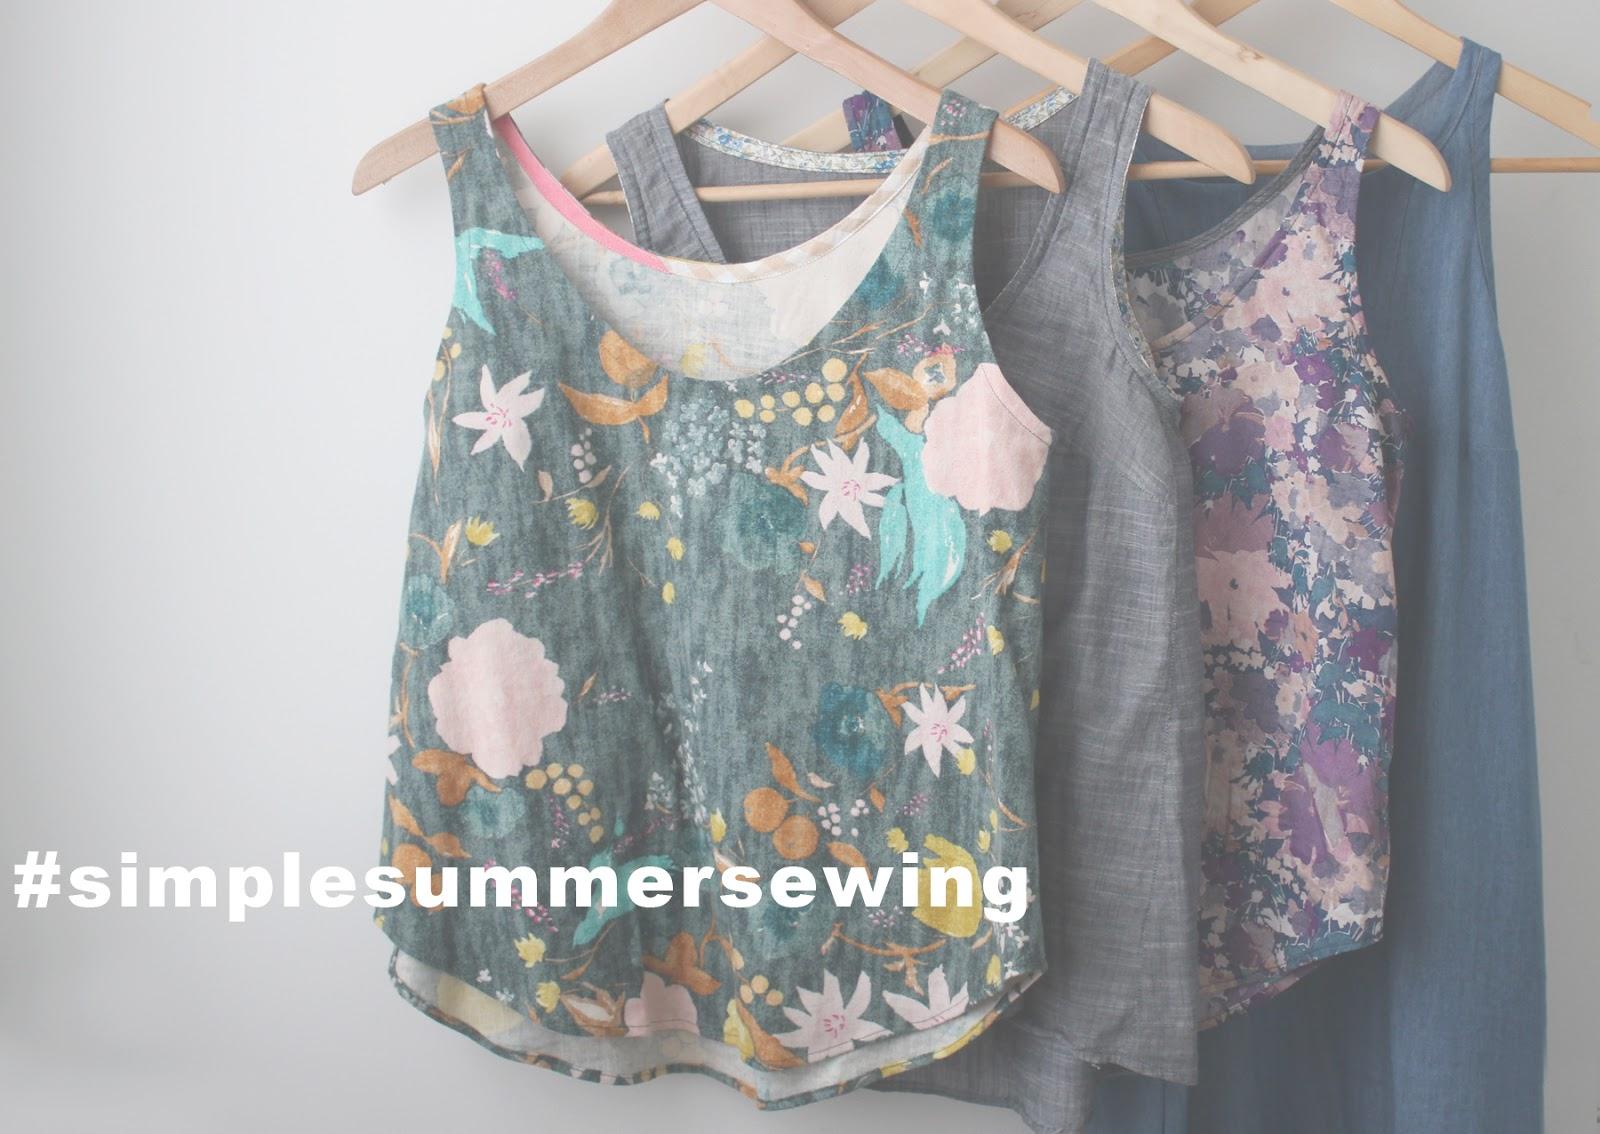 Sweetkm 14 womens simple summer sewing patterns for july 14 womens simple summer sewing patterns for july jeuxipadfo Images